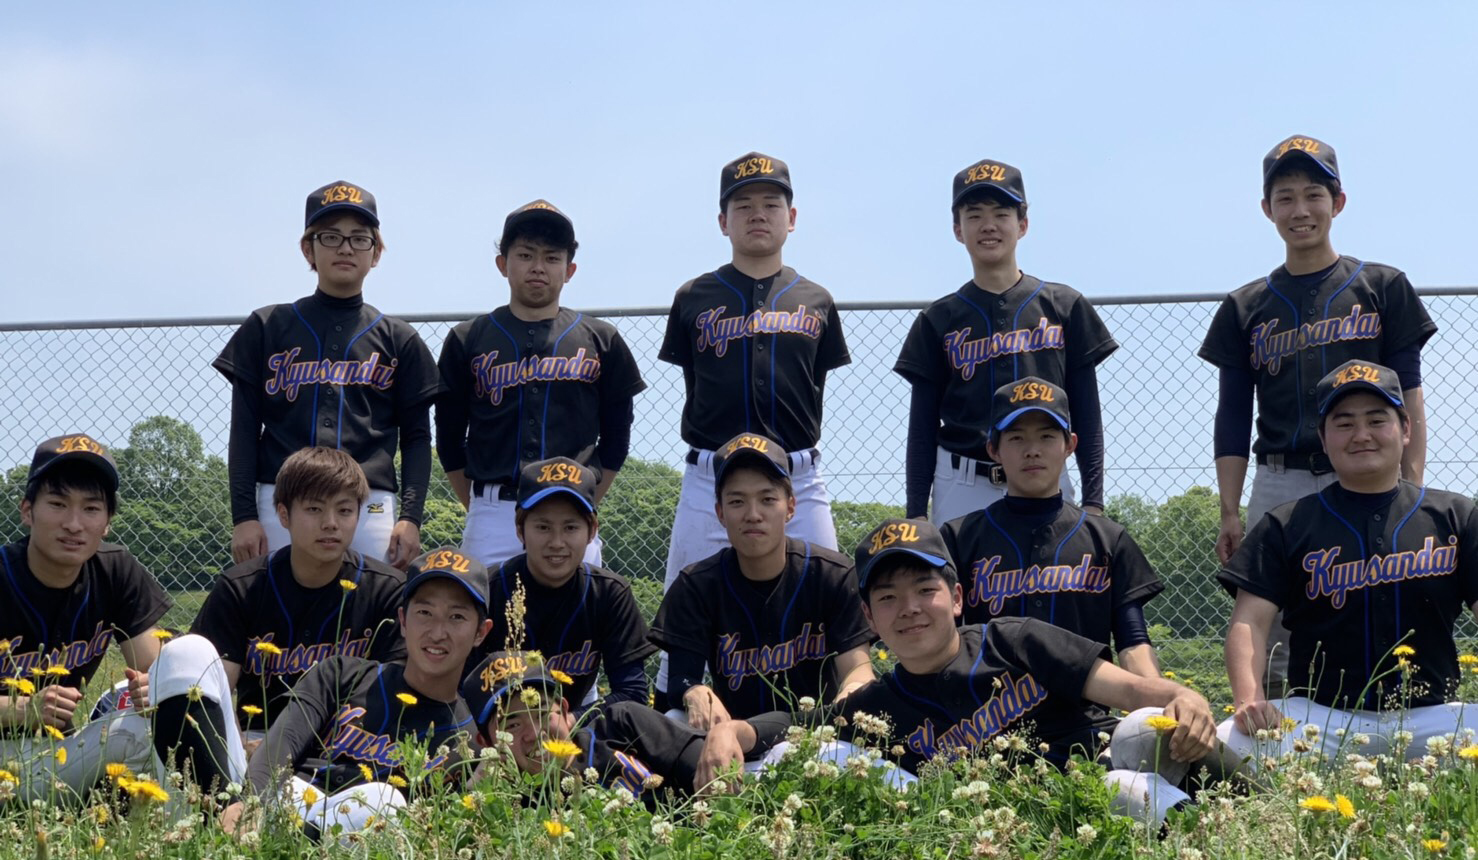 軟式野球同好会 九州大会優勝で全国へ